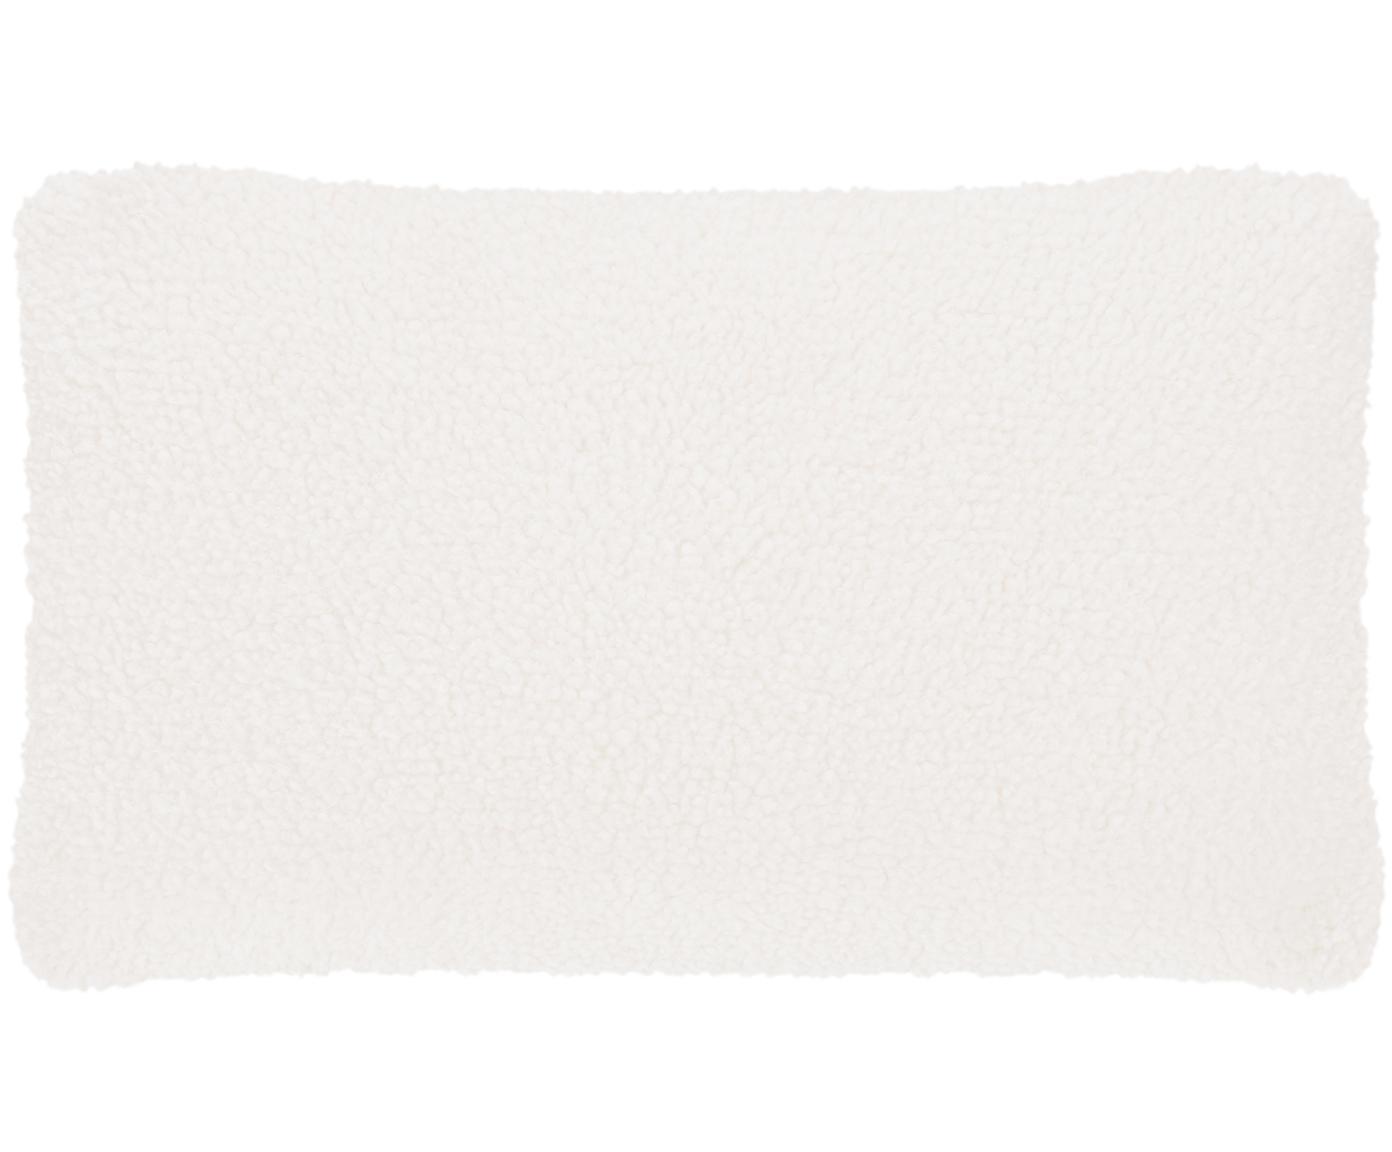 Teddy-kussenhoes Mille, Crèmekleurig, 30 x 50 cm